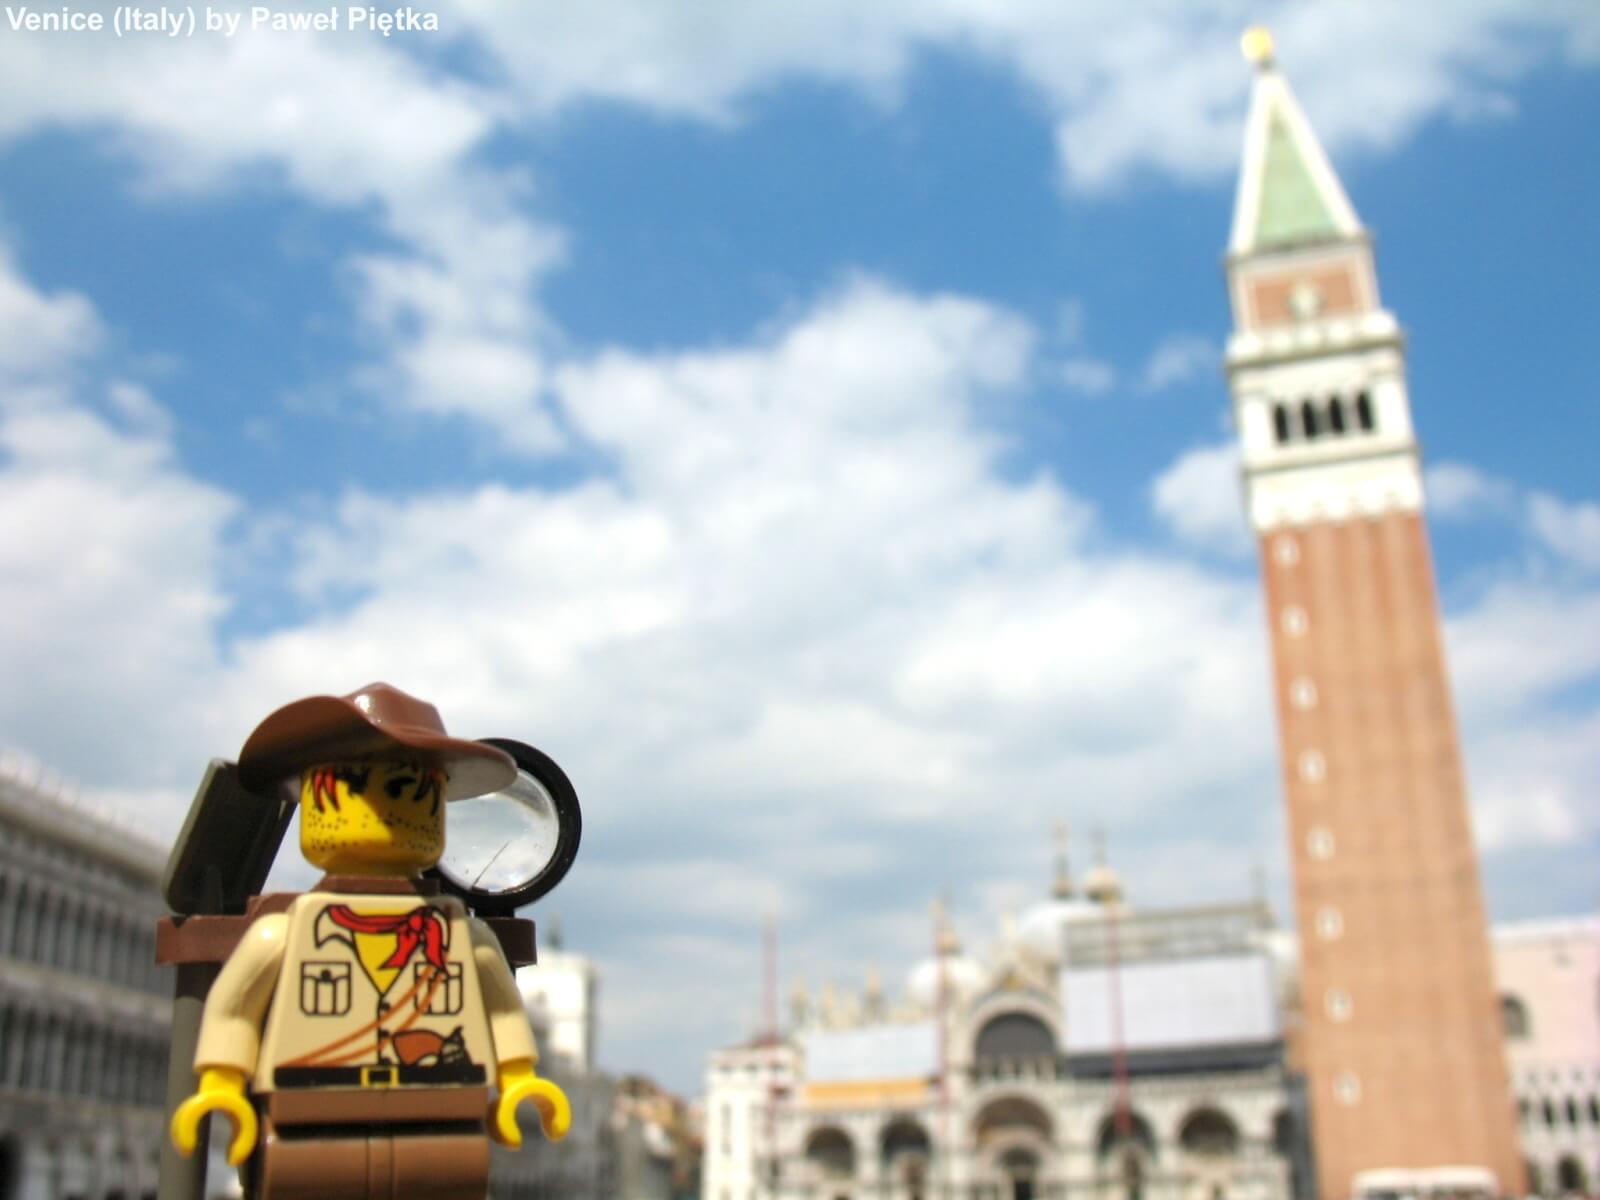 Venice (Italy) - Piazza San Marco and Basilica di San Marco